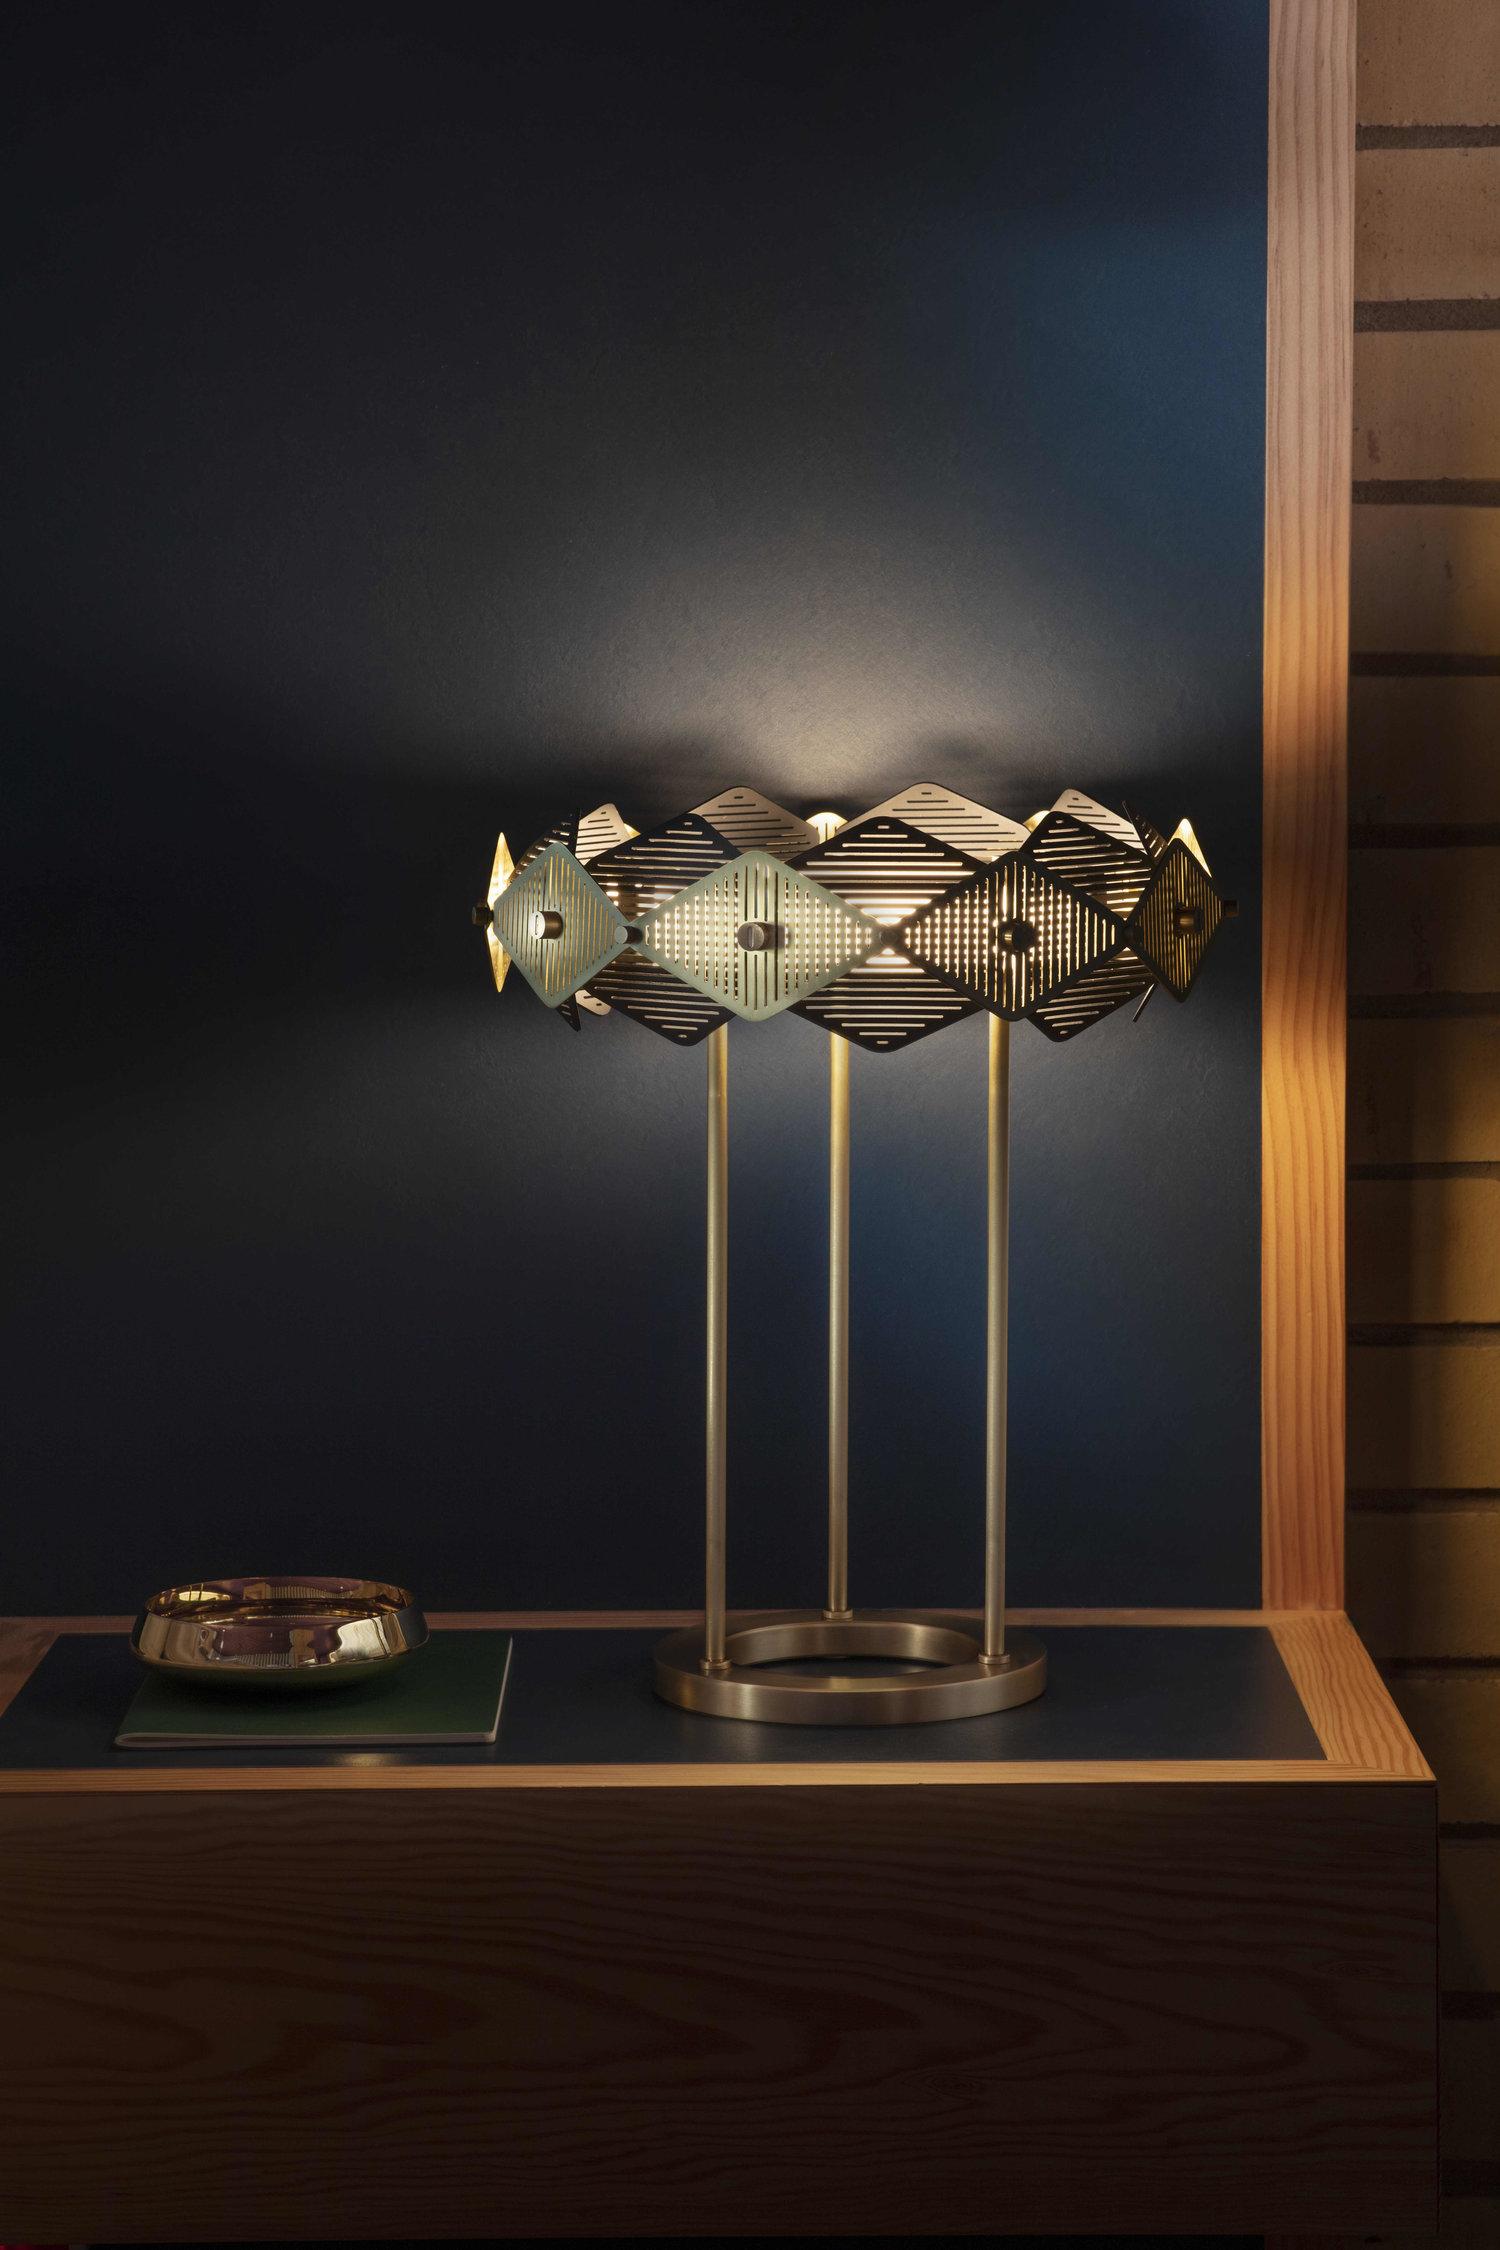 Bertfrank Настольная лампа Rote от британского бренда Bert Frank